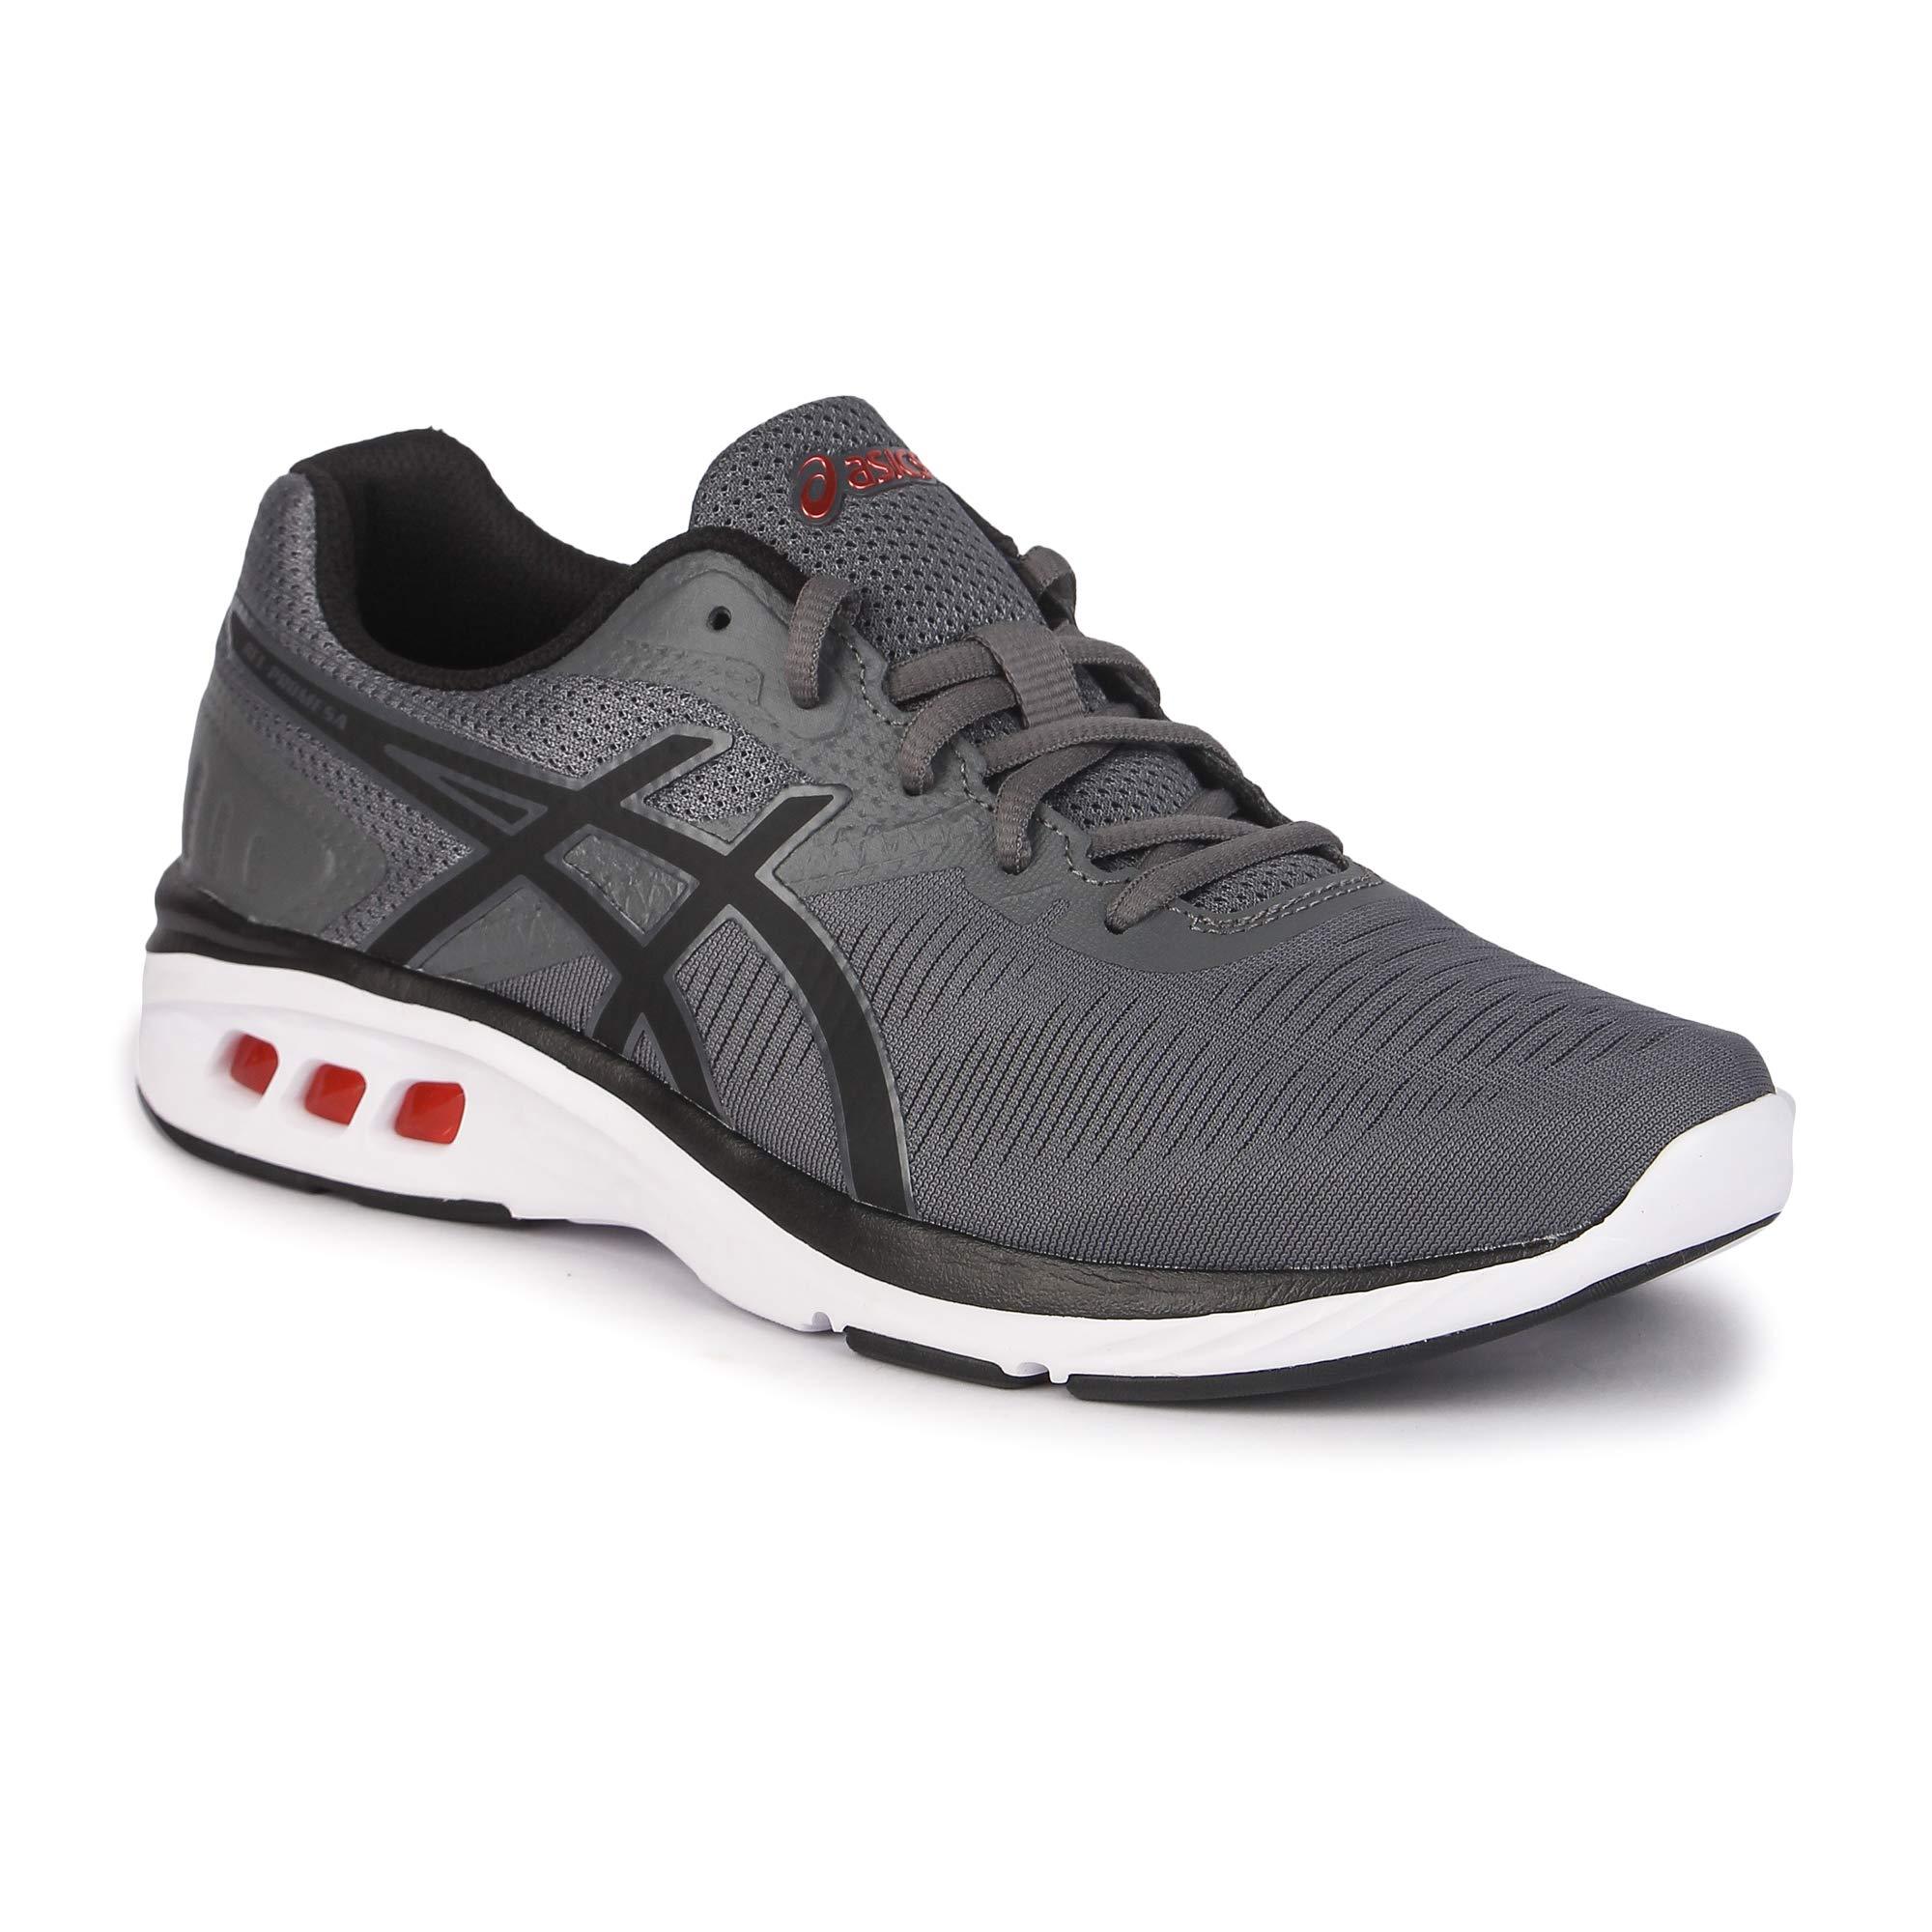 ASICS Men's Gel-Promesa Running Shoes